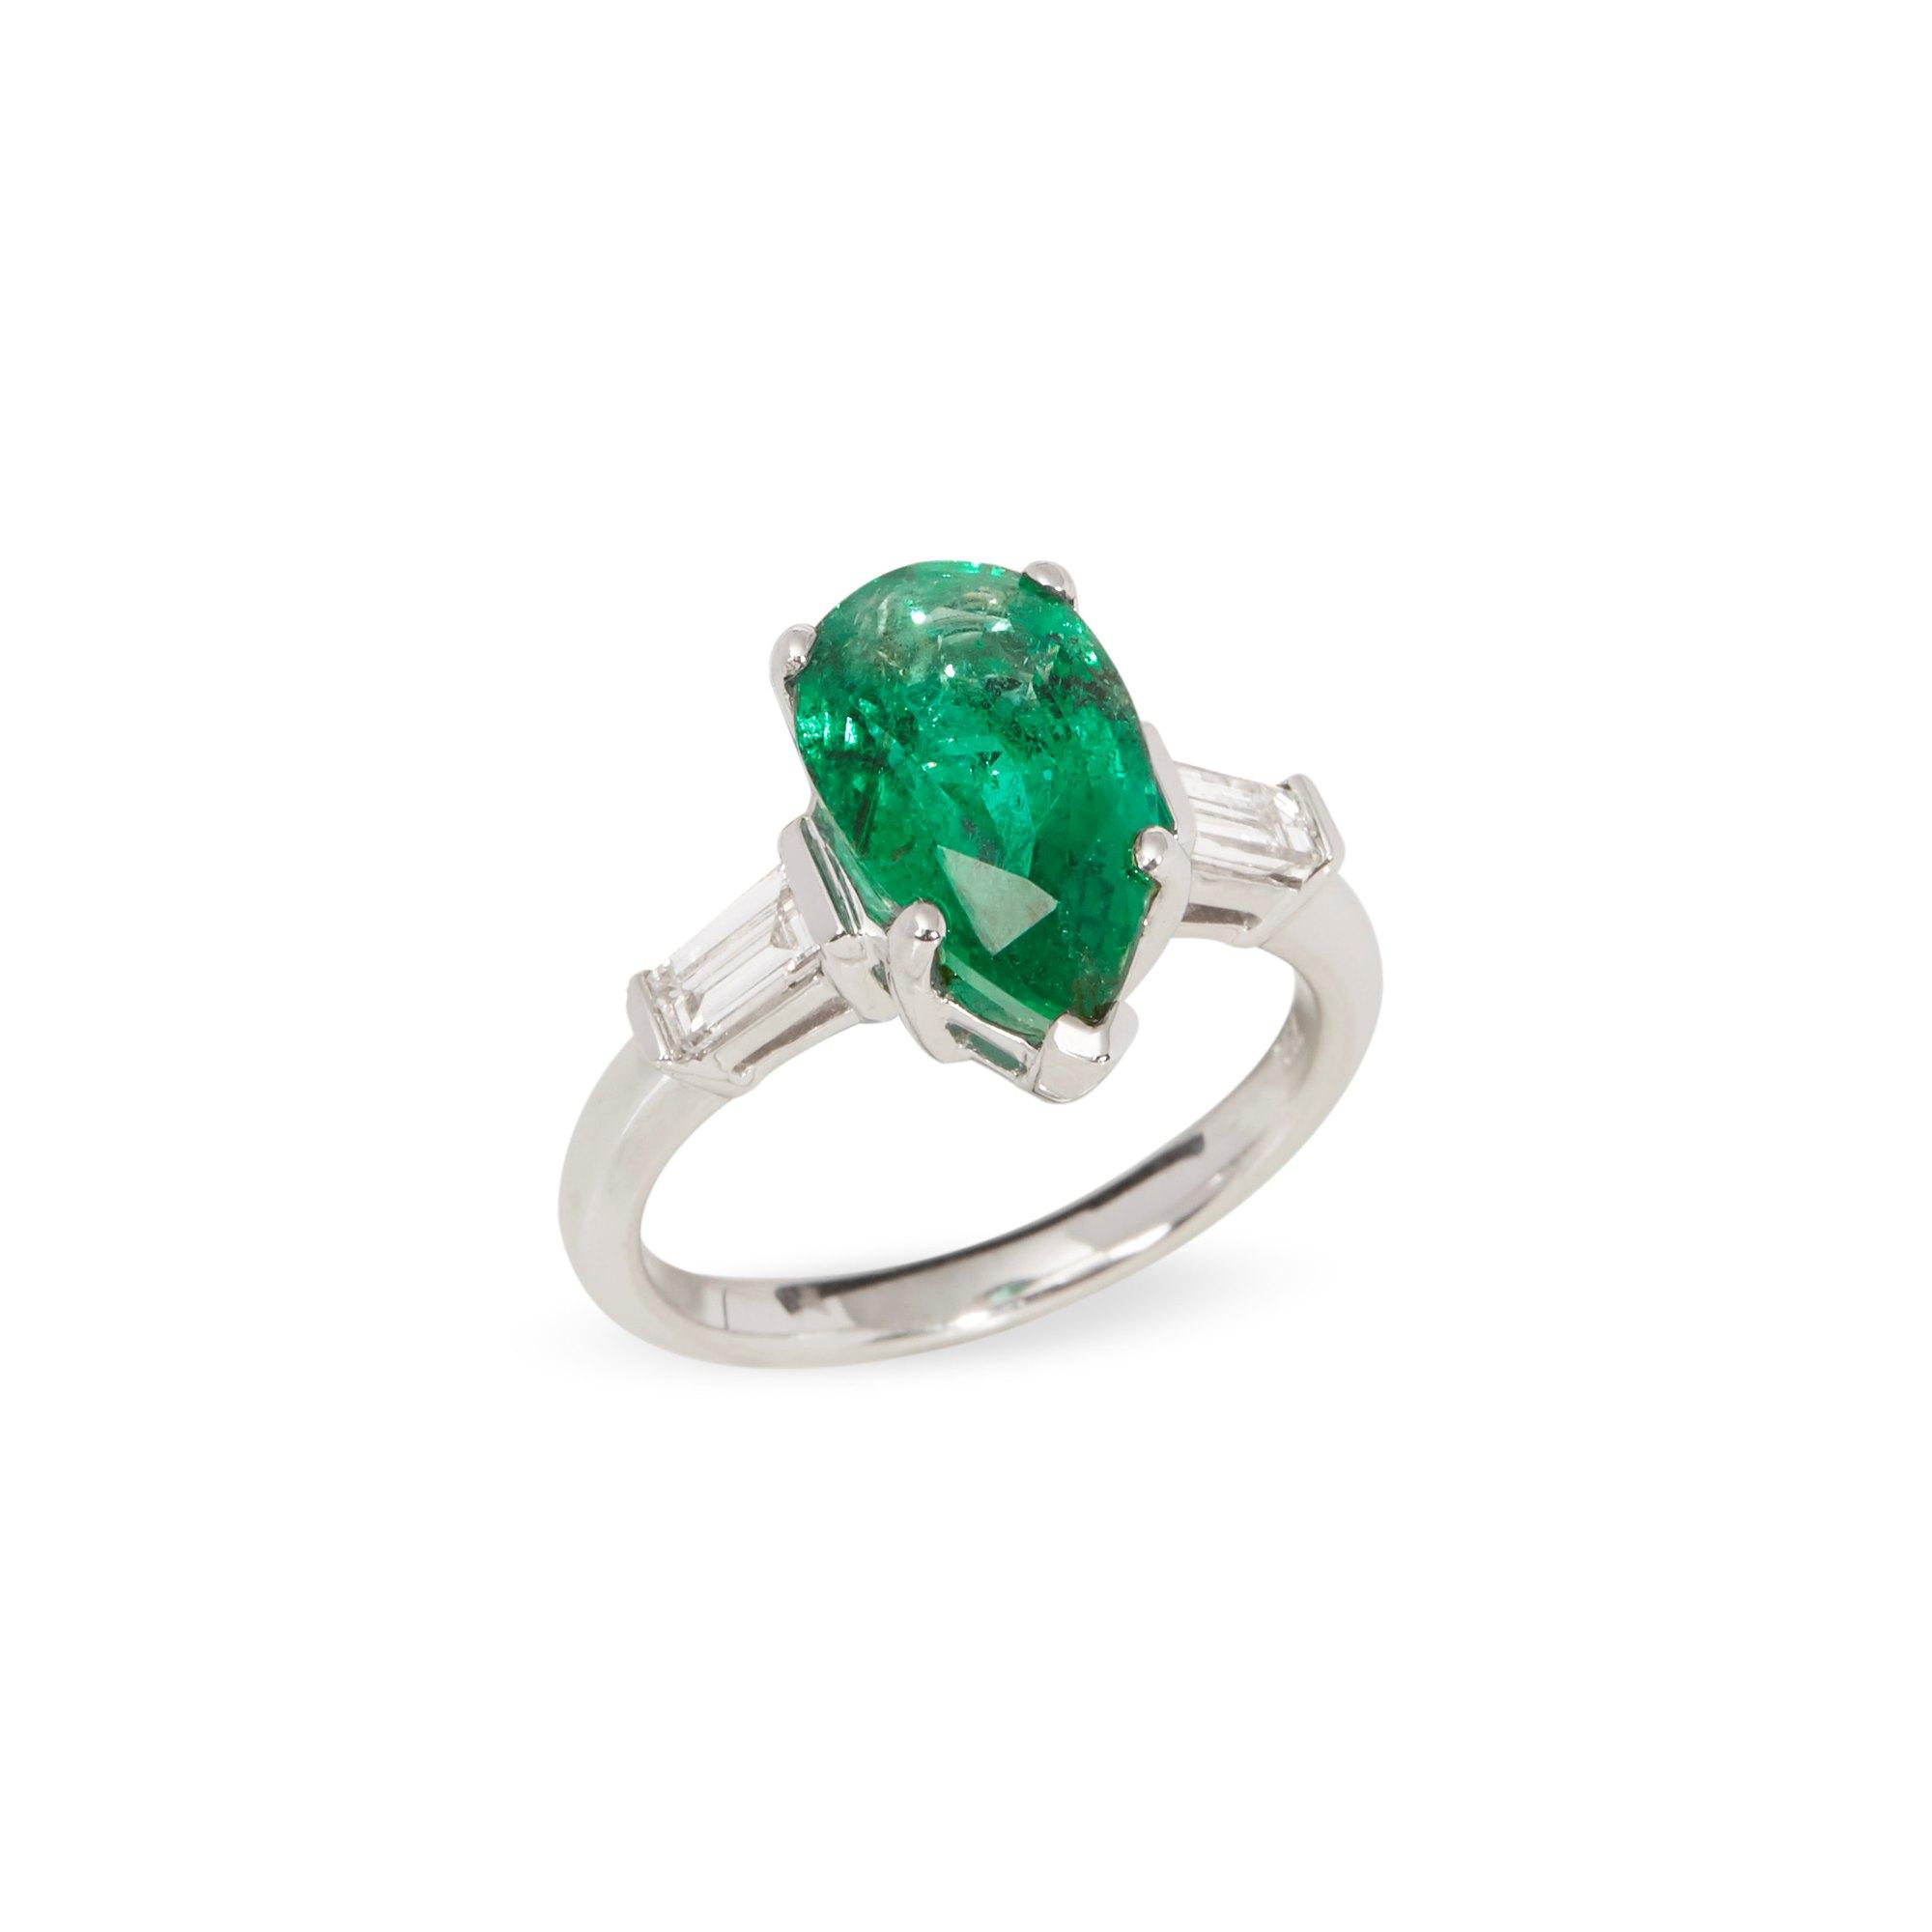 David Jerome Certified 3.45ct Untreated Brazilian Pear Cut Emerald and Diamond 18ct gold Ring